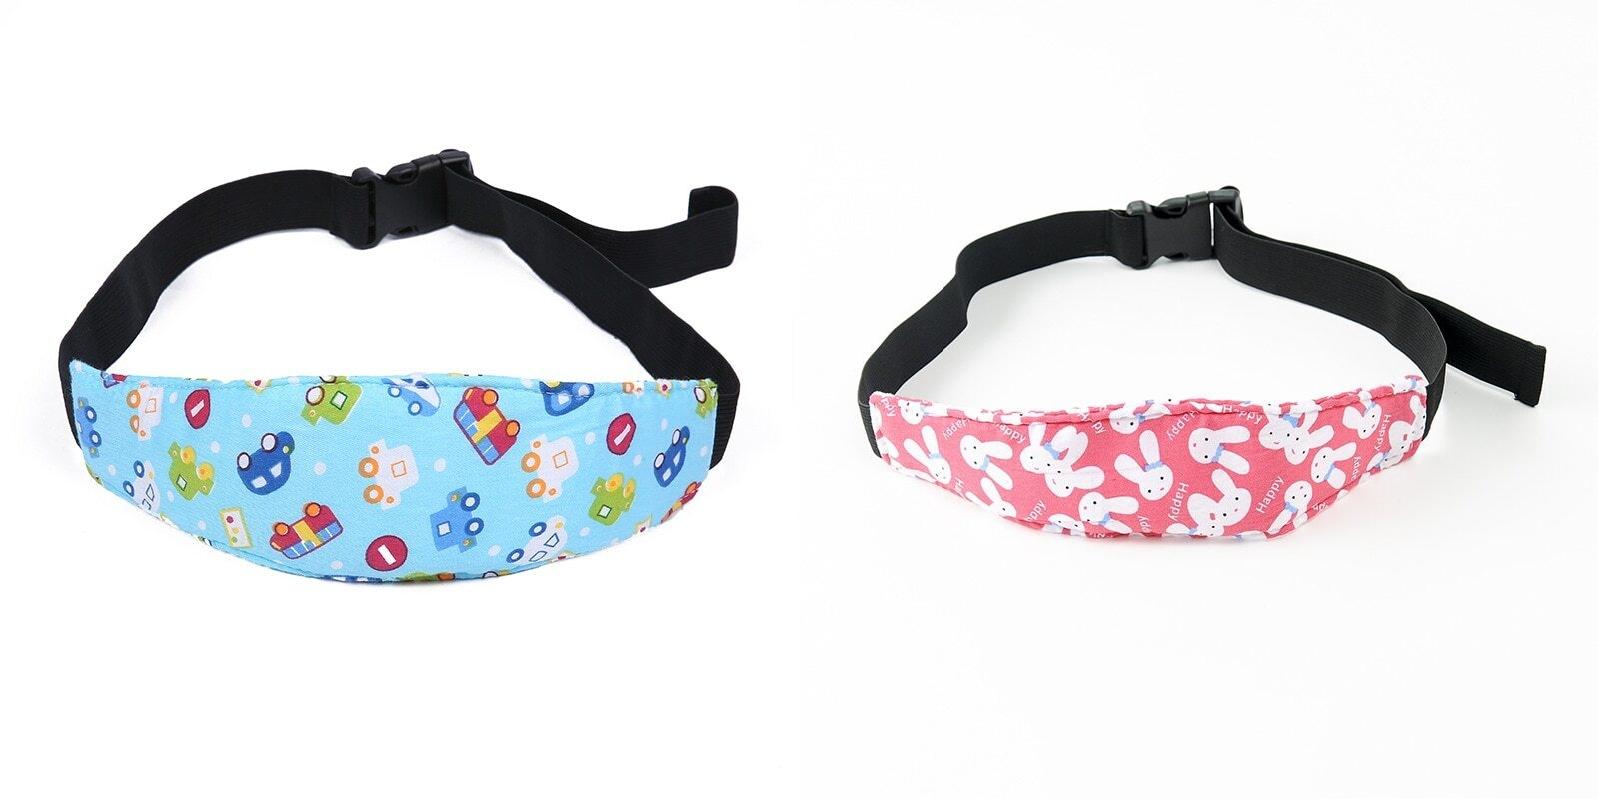 бебешка лента за глава - за момче или момиче